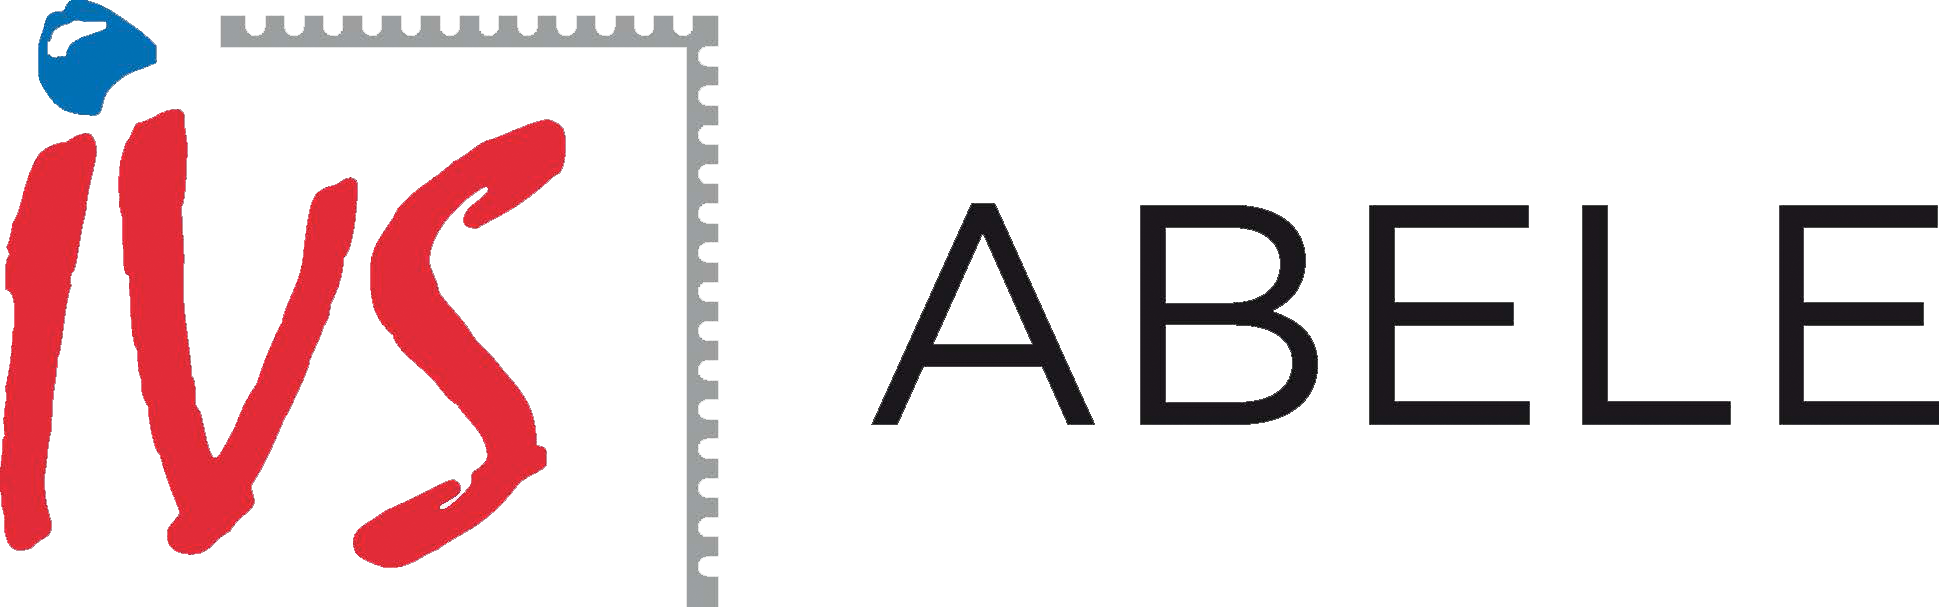 IVS Abele GmbH